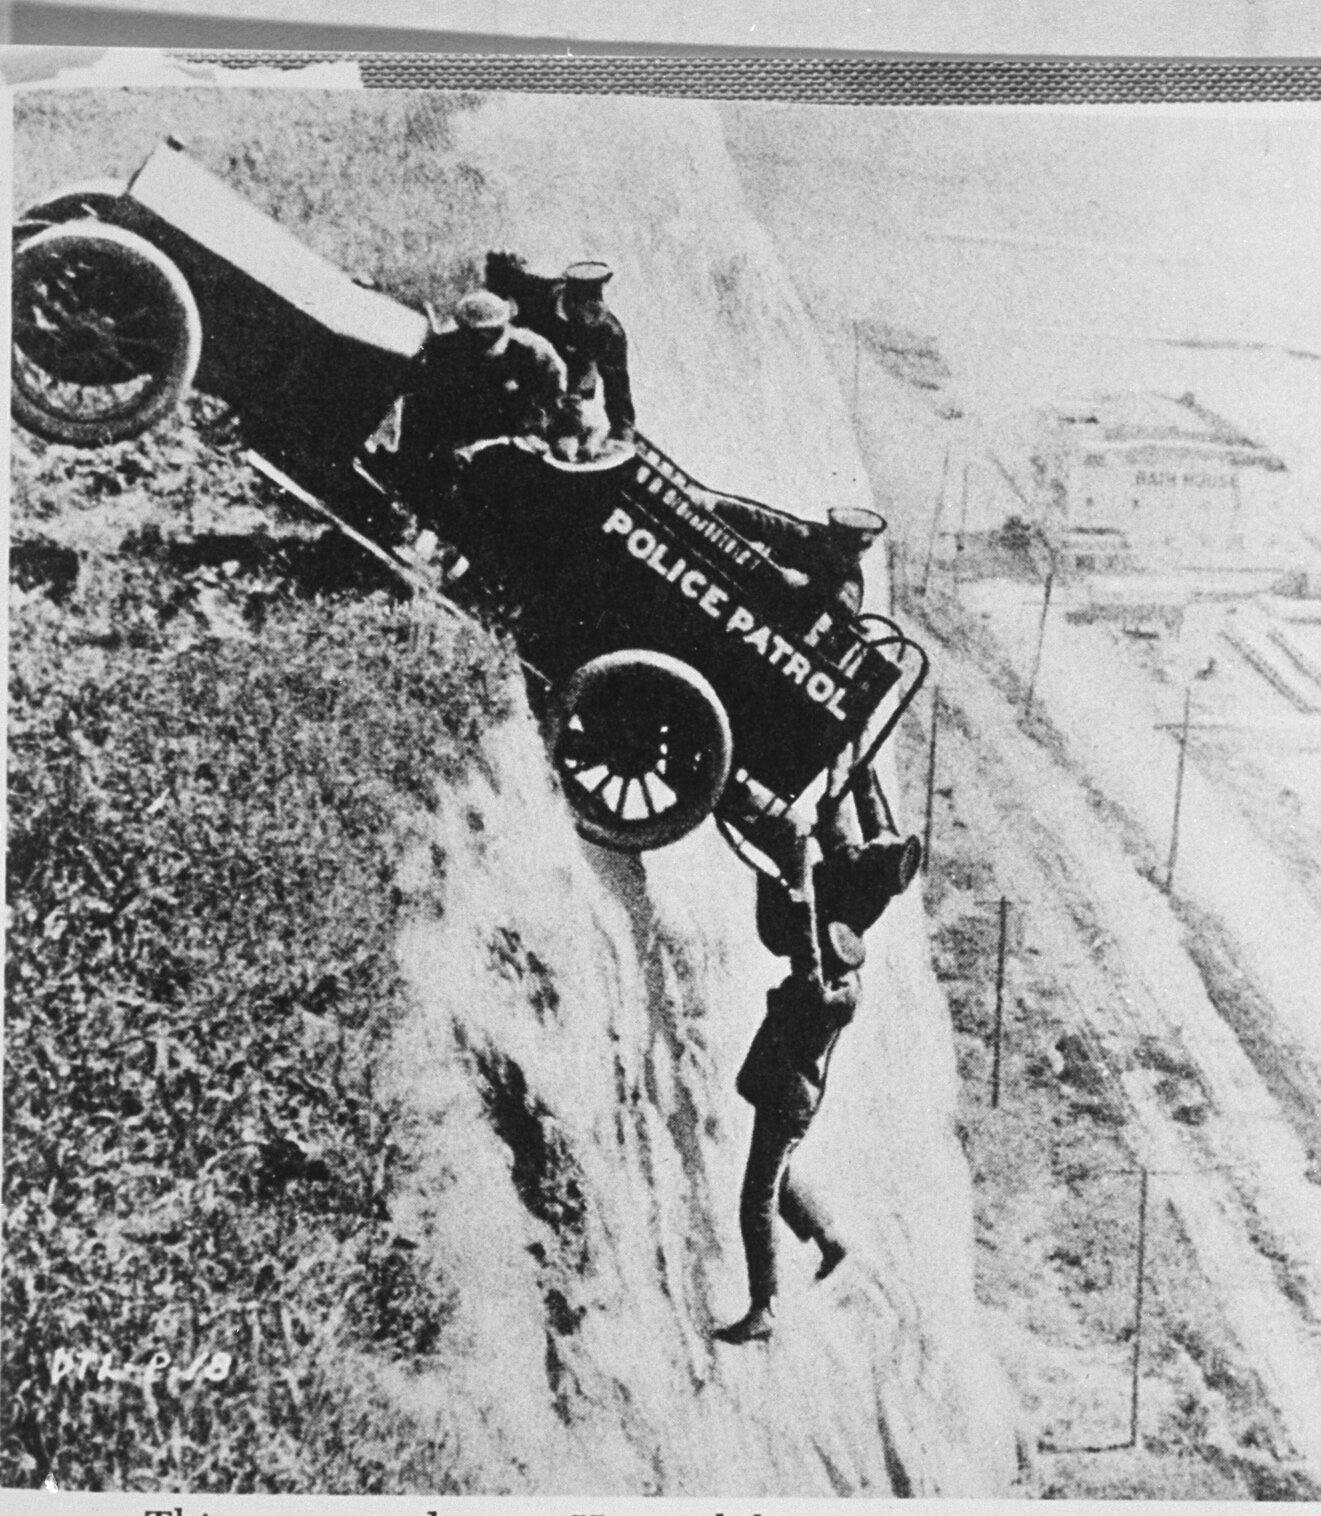 Keystone Cops movie stunt